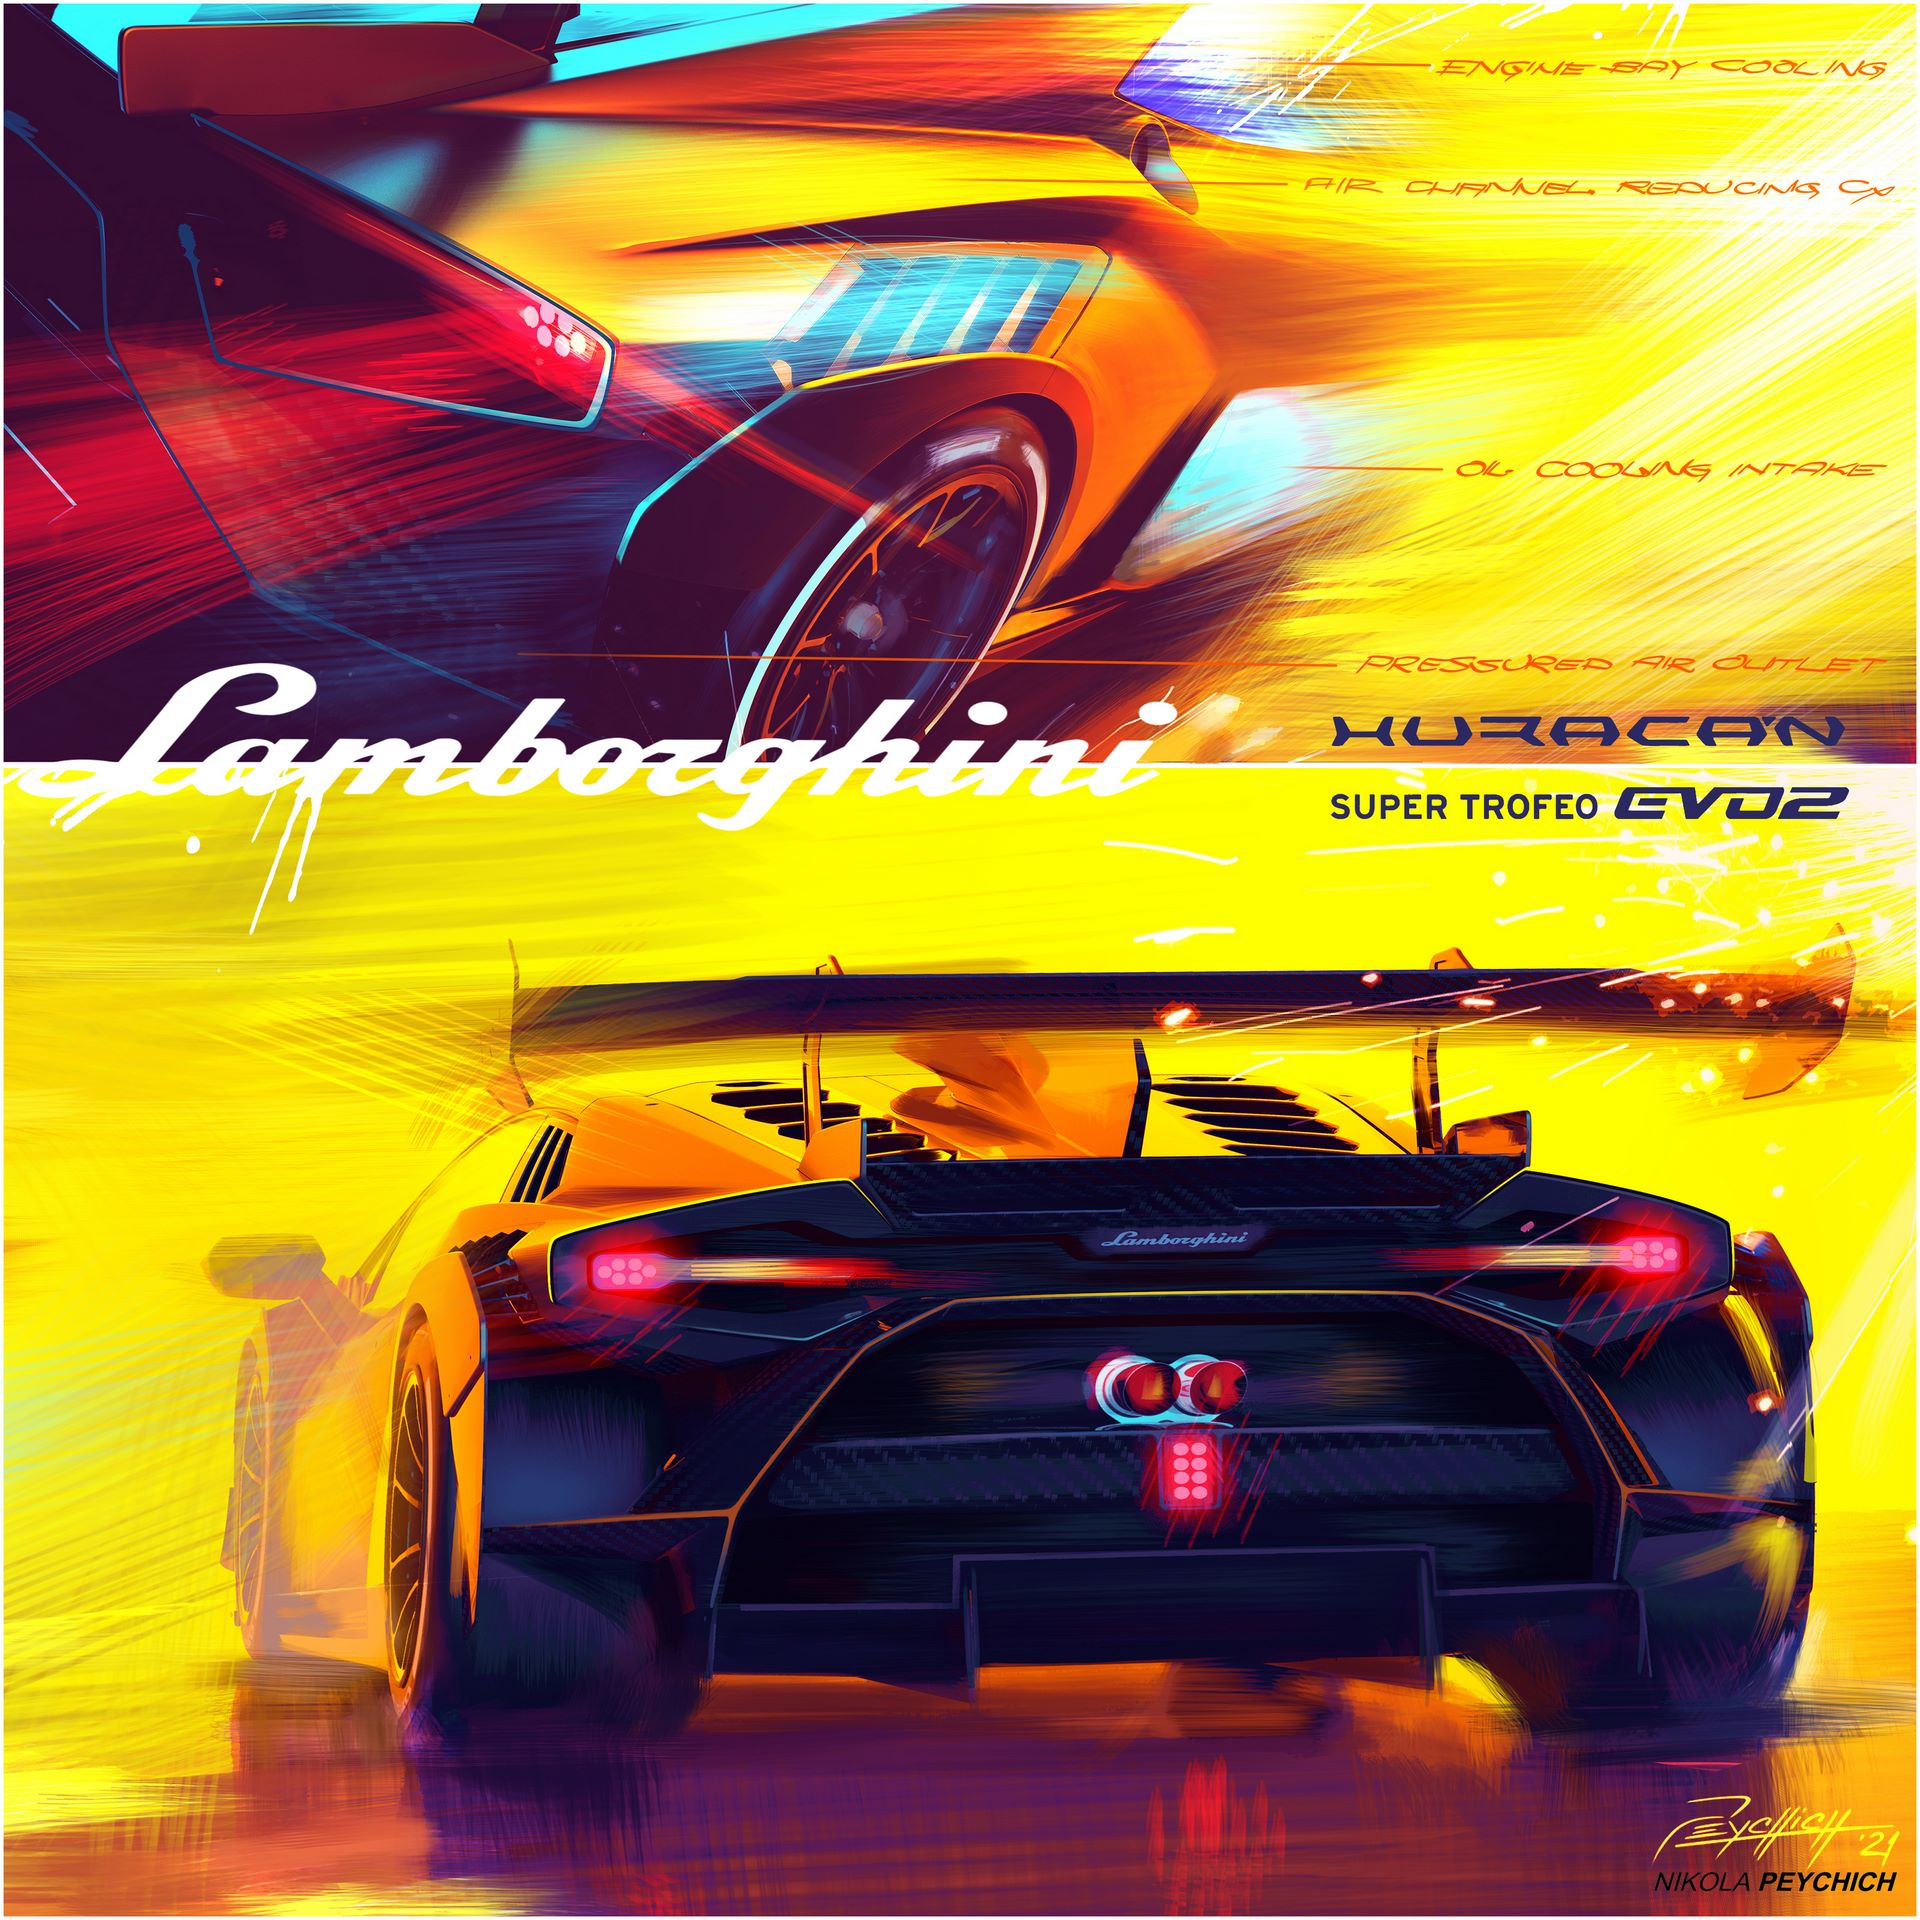 Lamborghini-Huracan-Super-Trofeo-EVO2-19